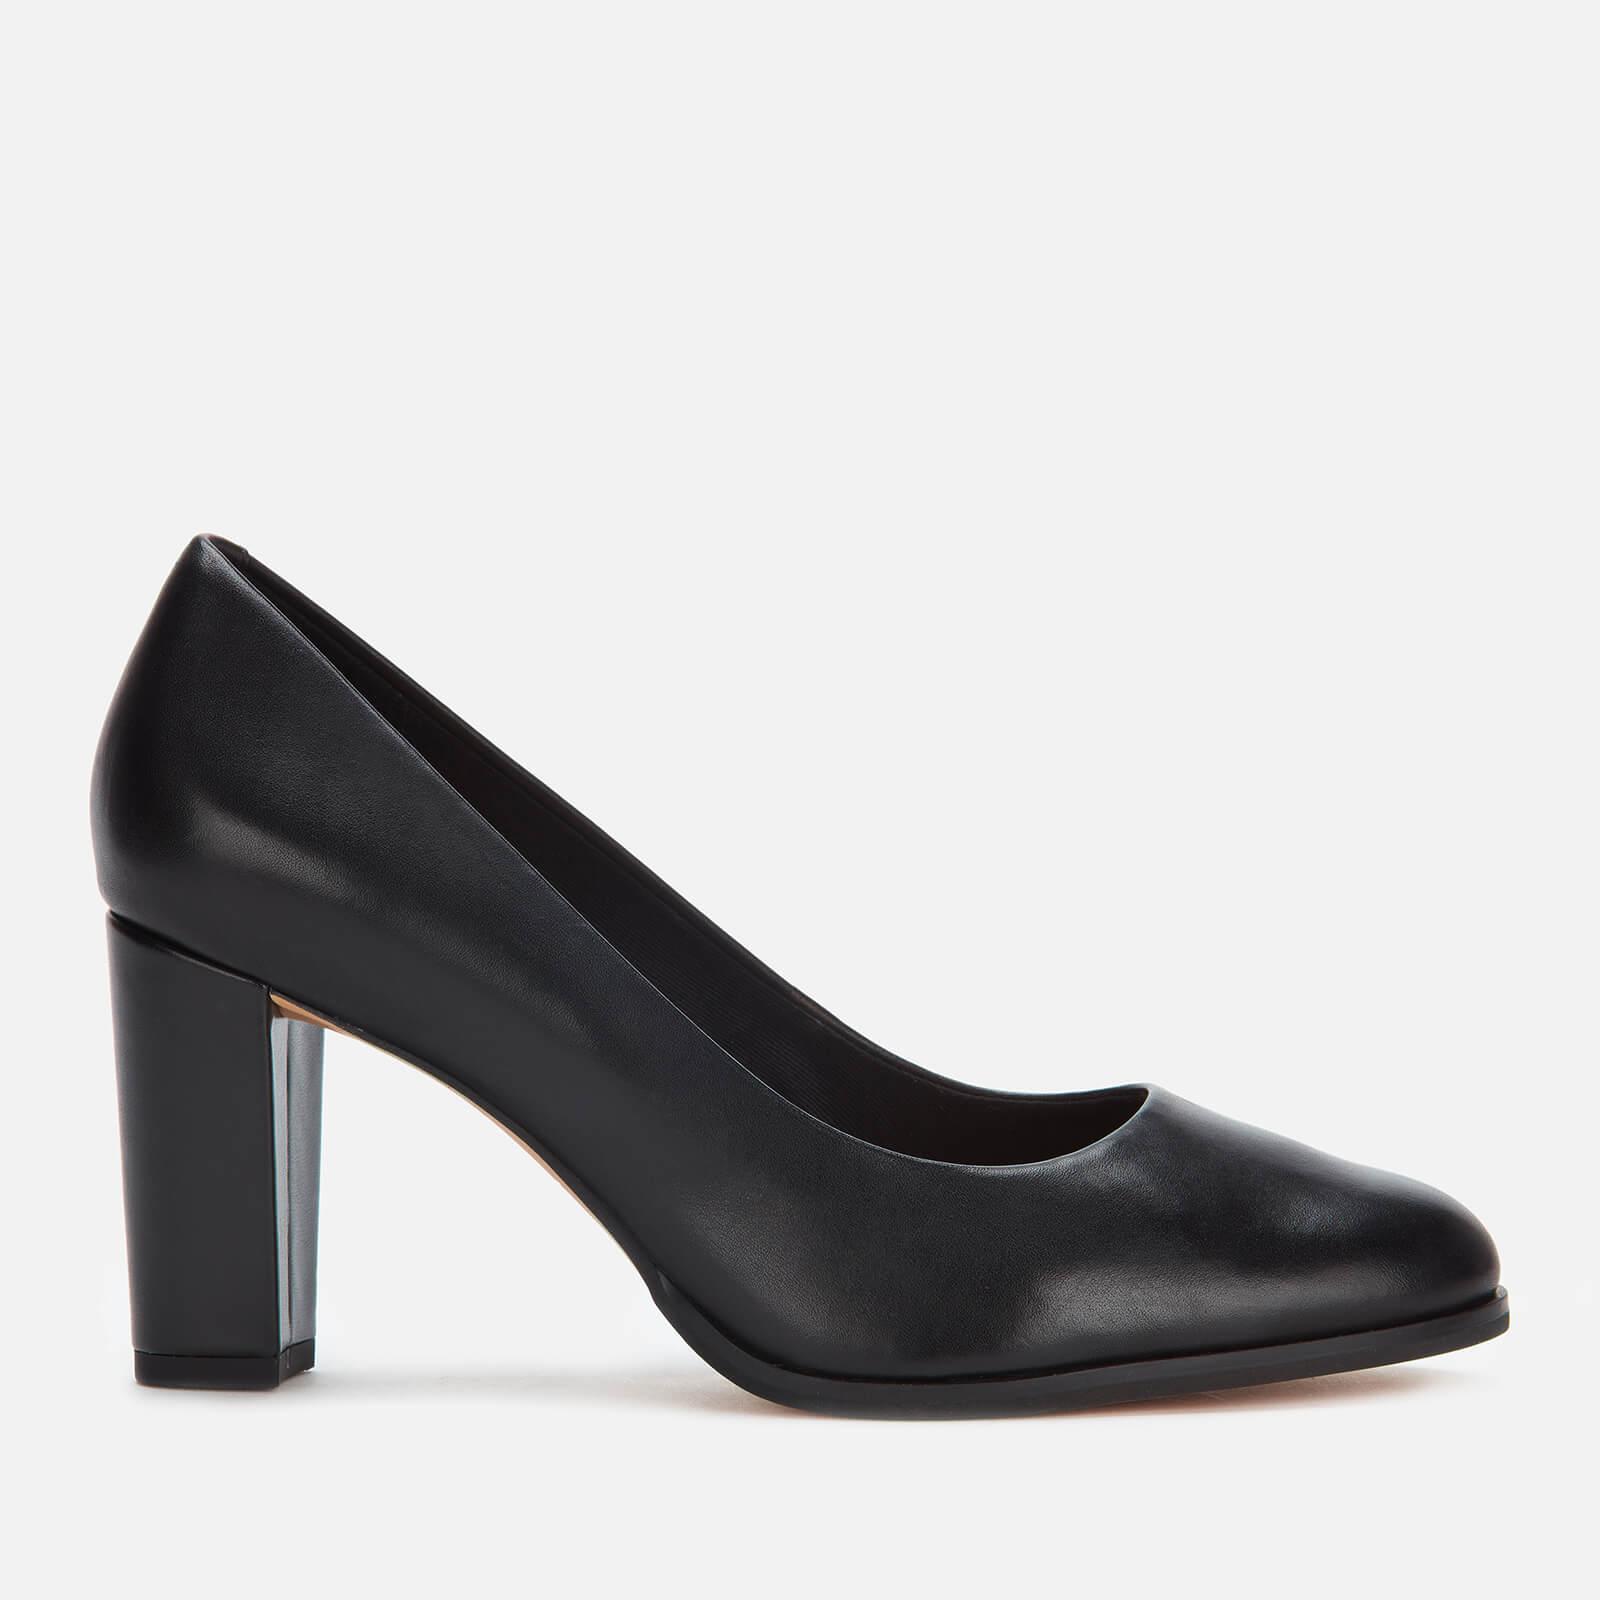 Kaylin Cara Leather Court Shoes - Black